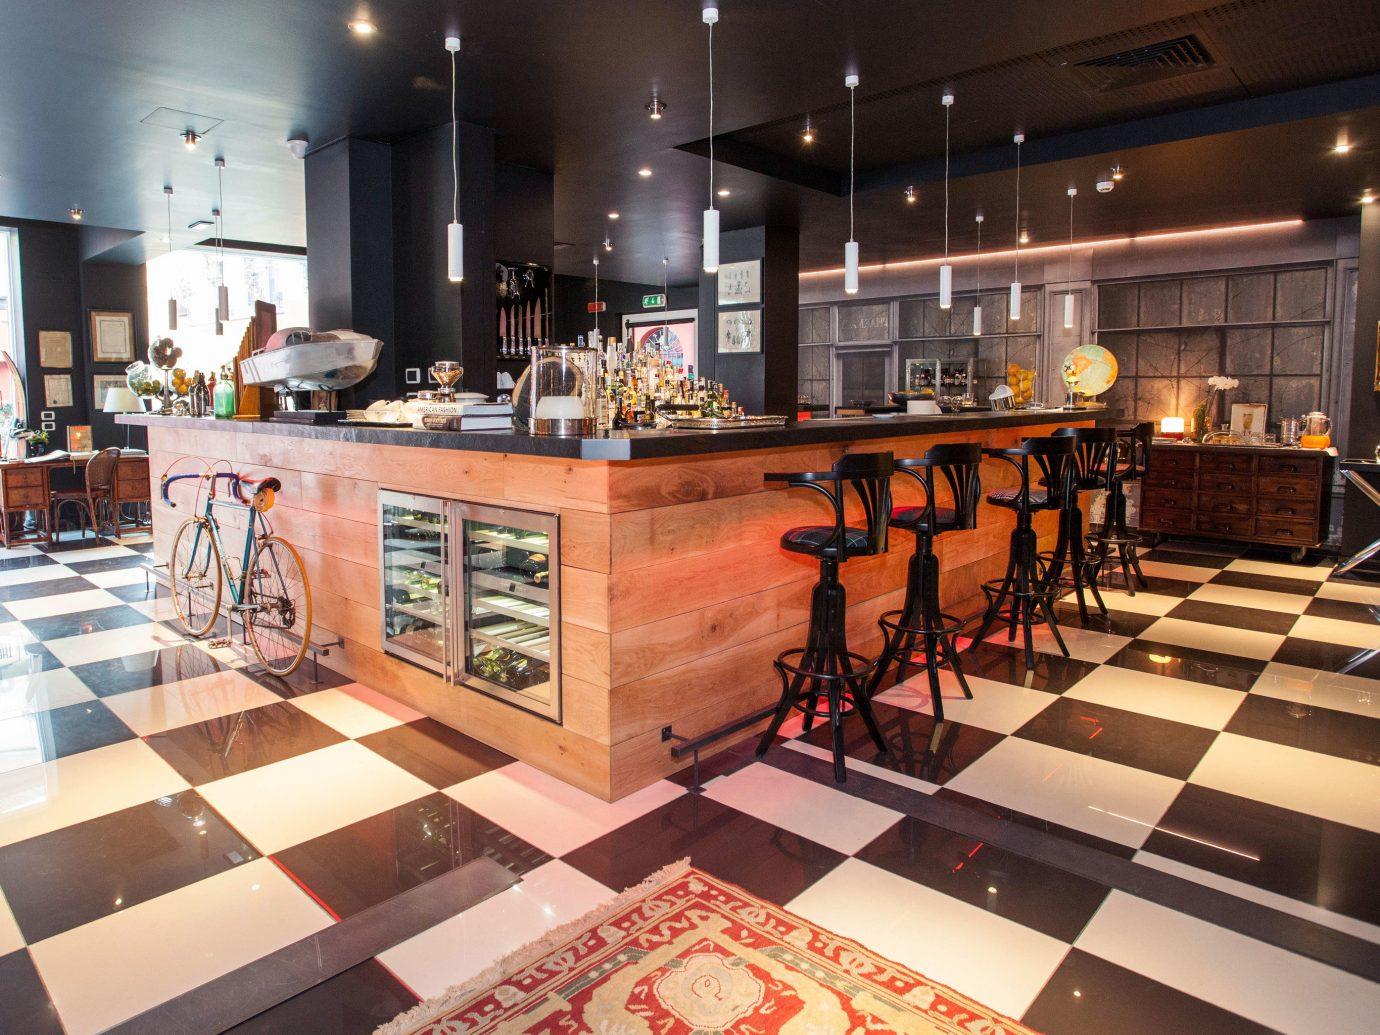 Hotels Italy Milan indoor floor interior design Design Boutique Lobby retail tourist attraction tiled